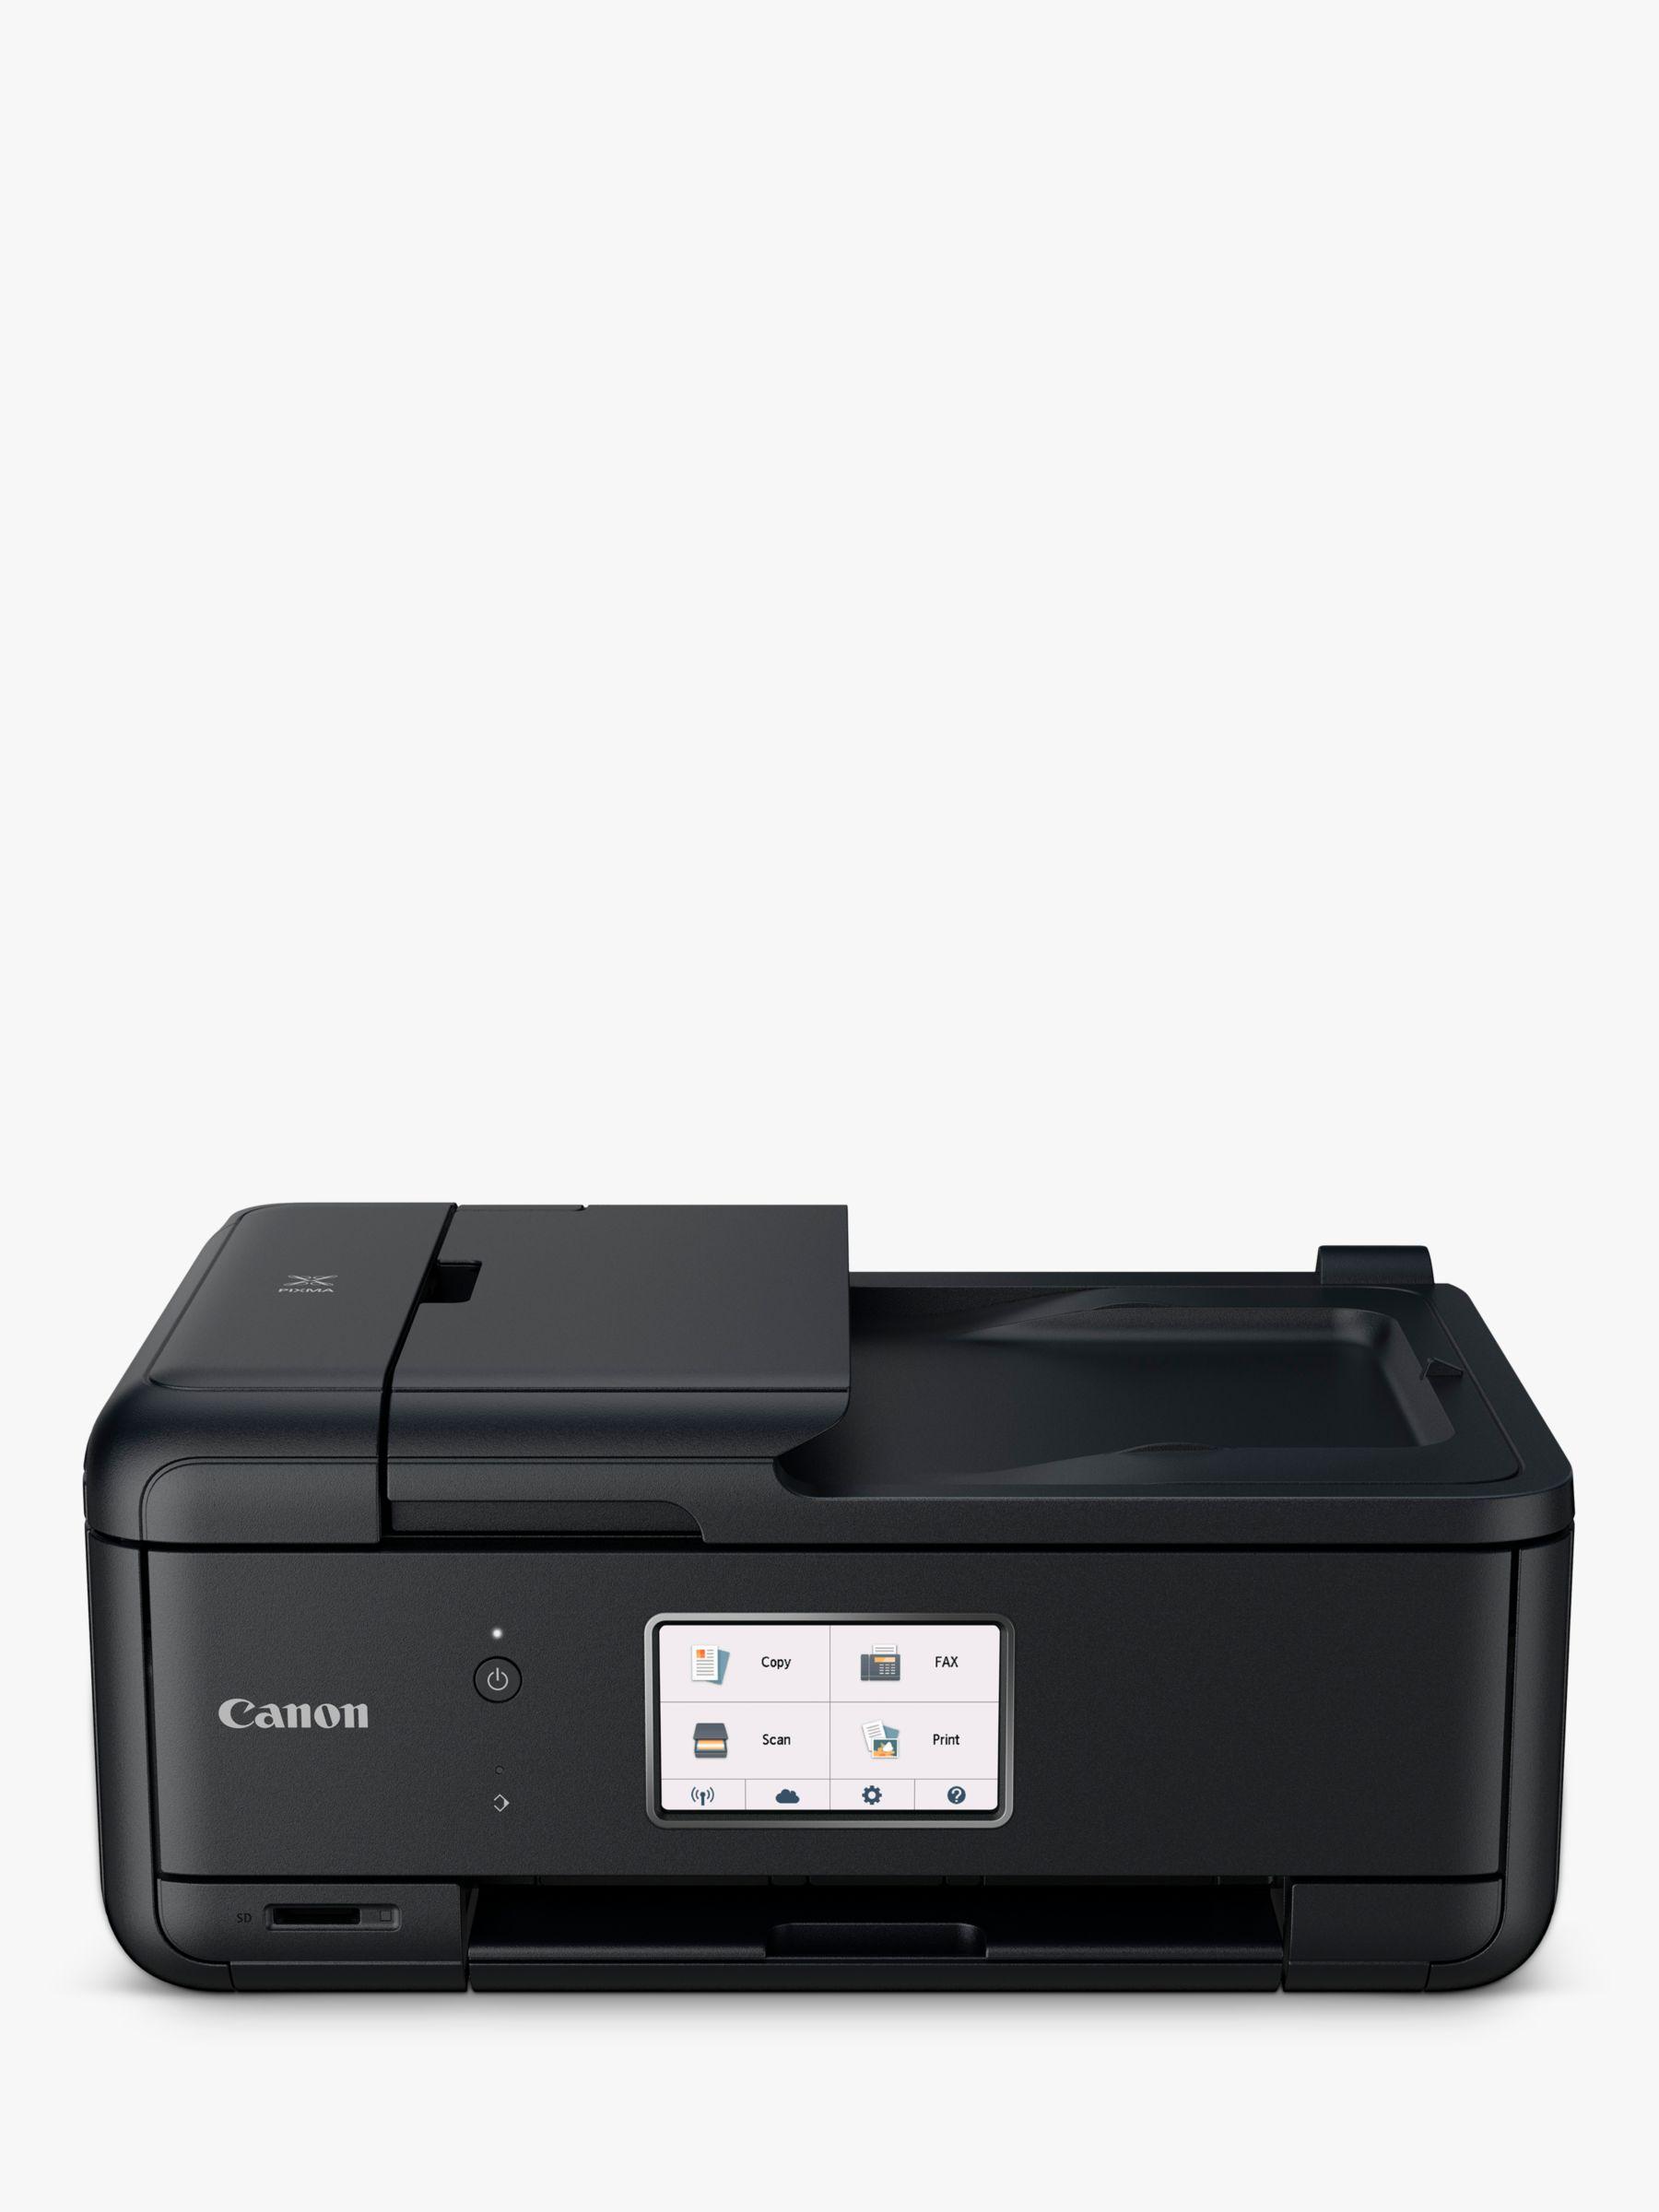 Canon Canon PIXMA TR8550 All-in-One Wireless Wi-Fi Printer with Touch Screen, Black